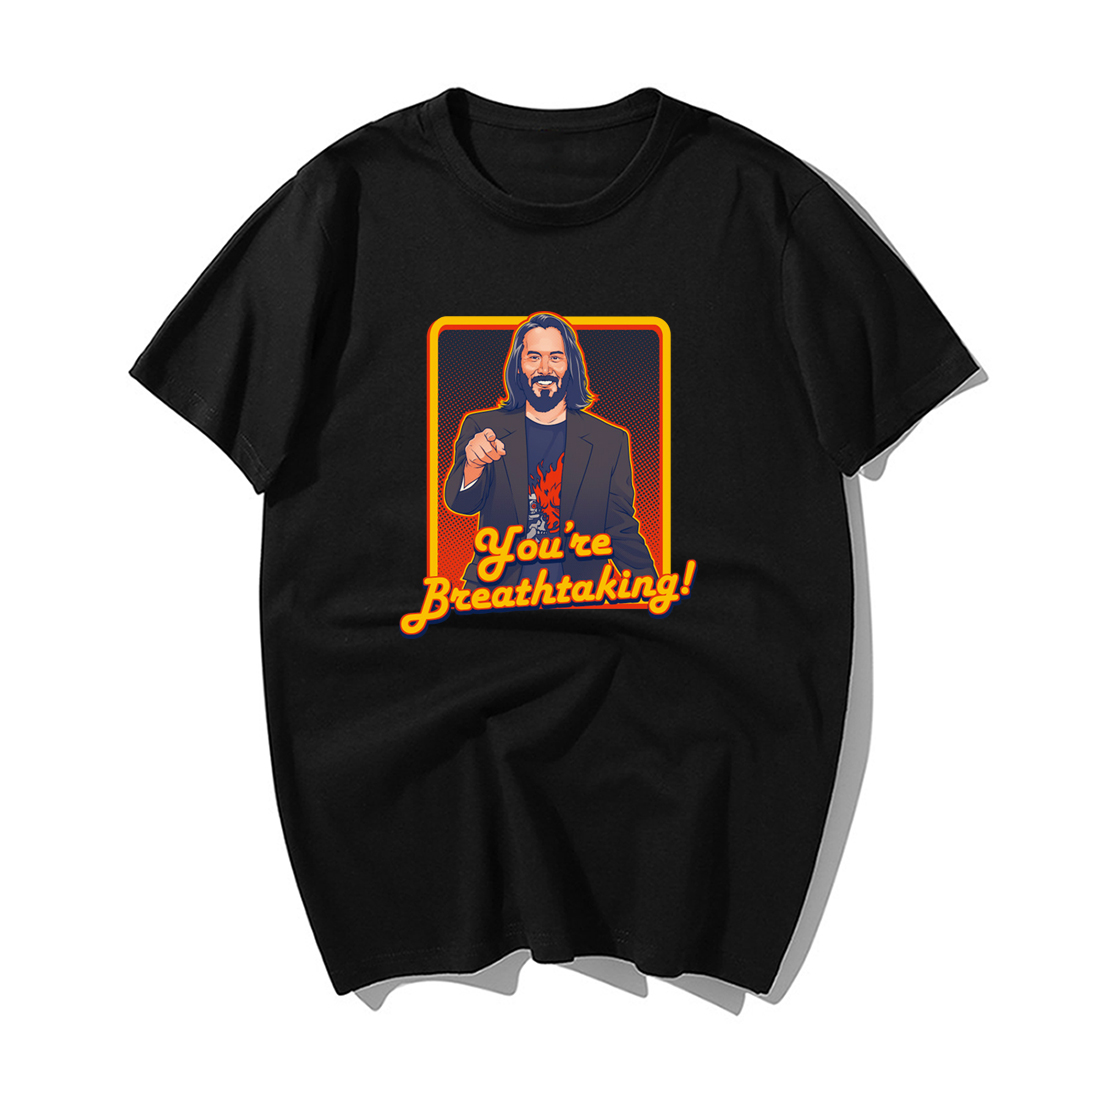 Keanu Reeves You Are Breathtaking Fashion Print T Shirt Men Summer Cotton Short Sleeve Tshirt Hip Hop Harajuku Streetwear Tops